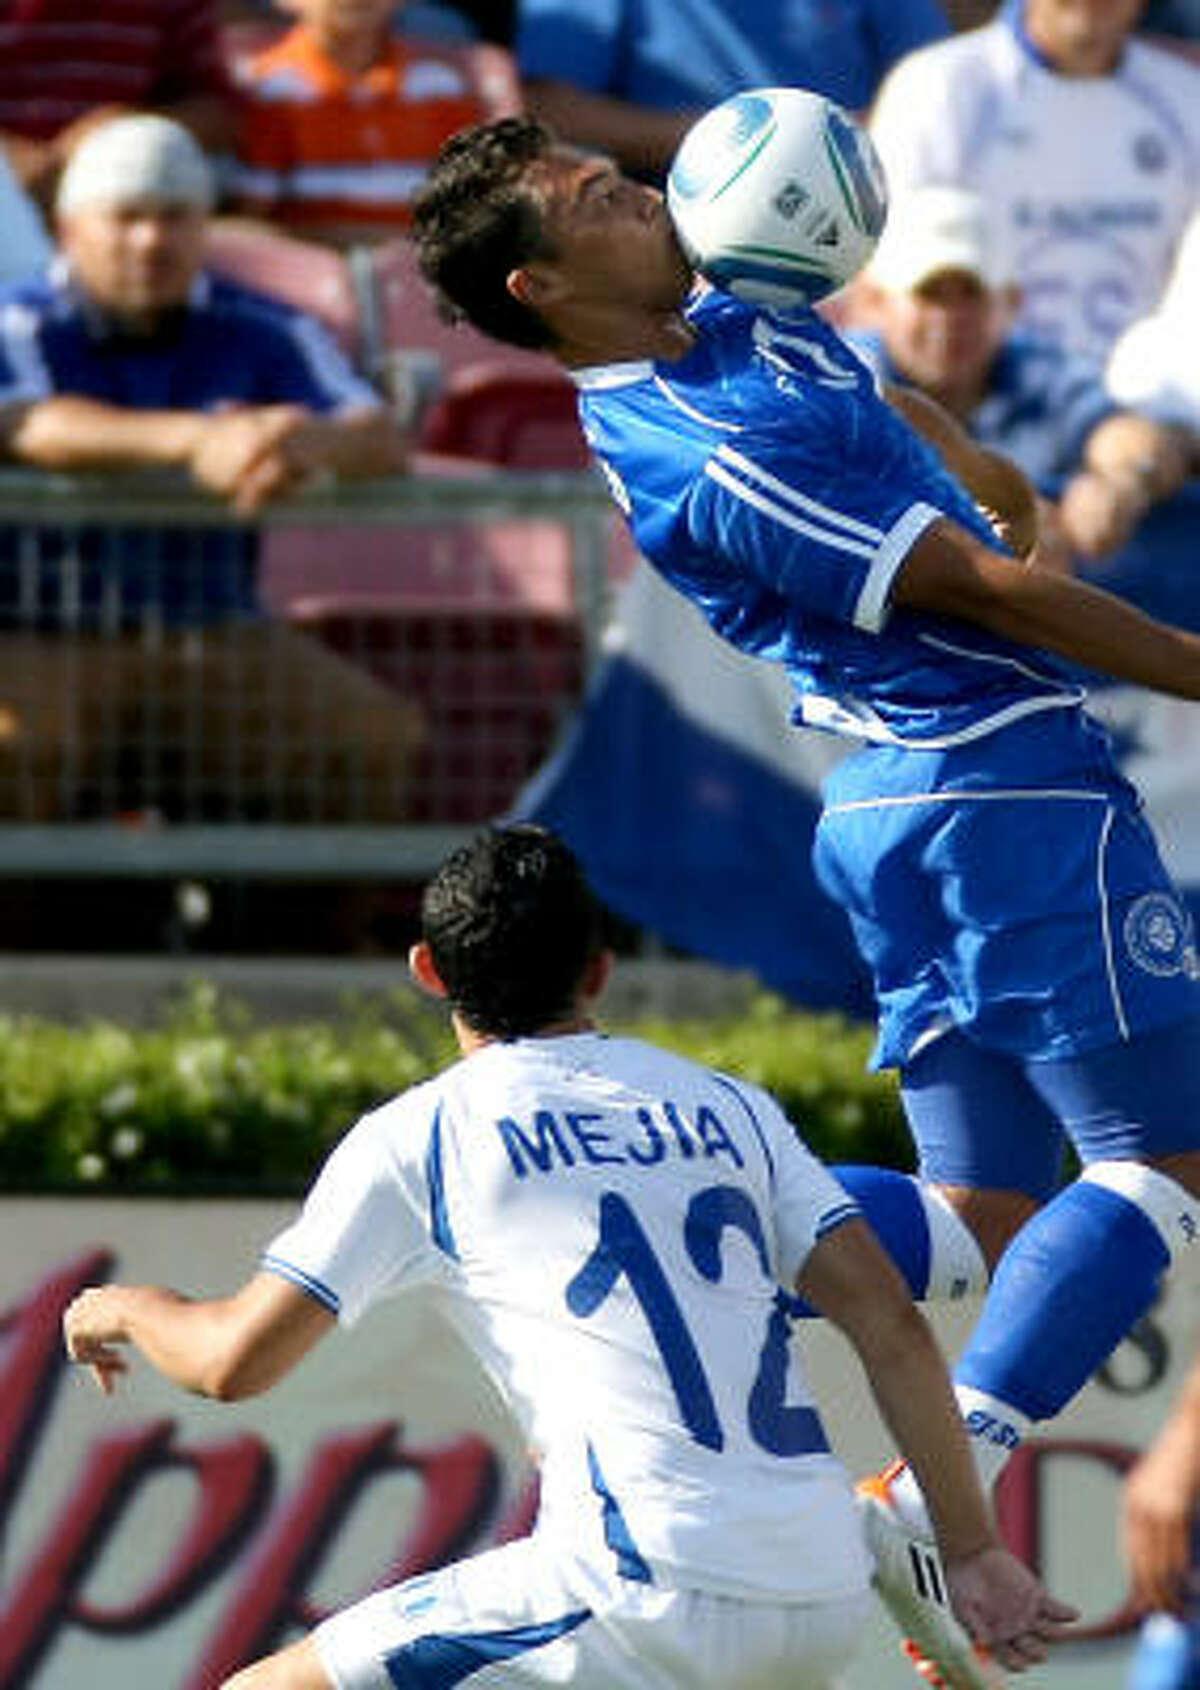 El Salvador's Mark Lester Blanco, top, controls the ball as Honduras' Alfredo Antonio Mejia looks on in the second half.